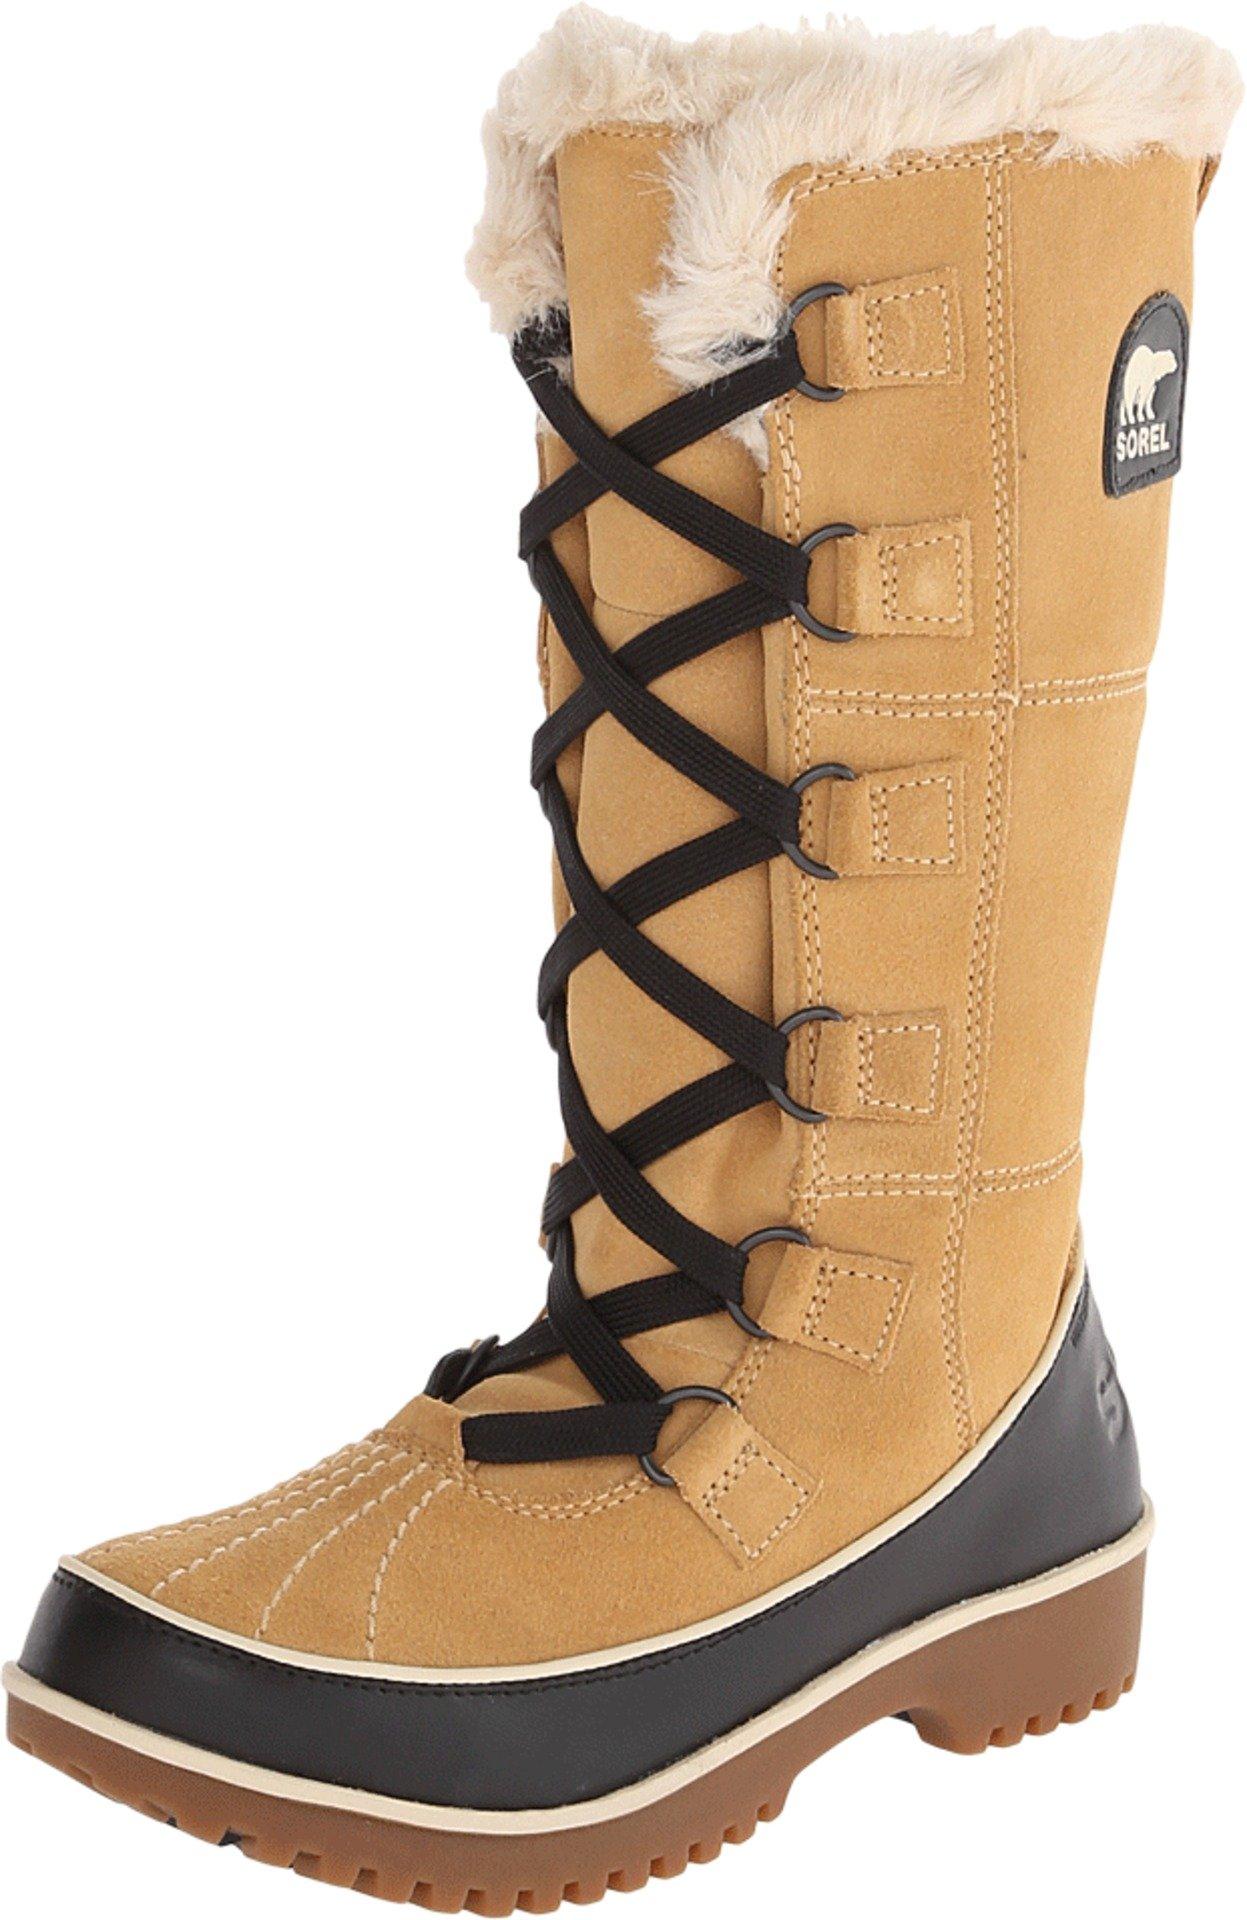 Sorel Tivoli High II Boot - Women's Curry 8